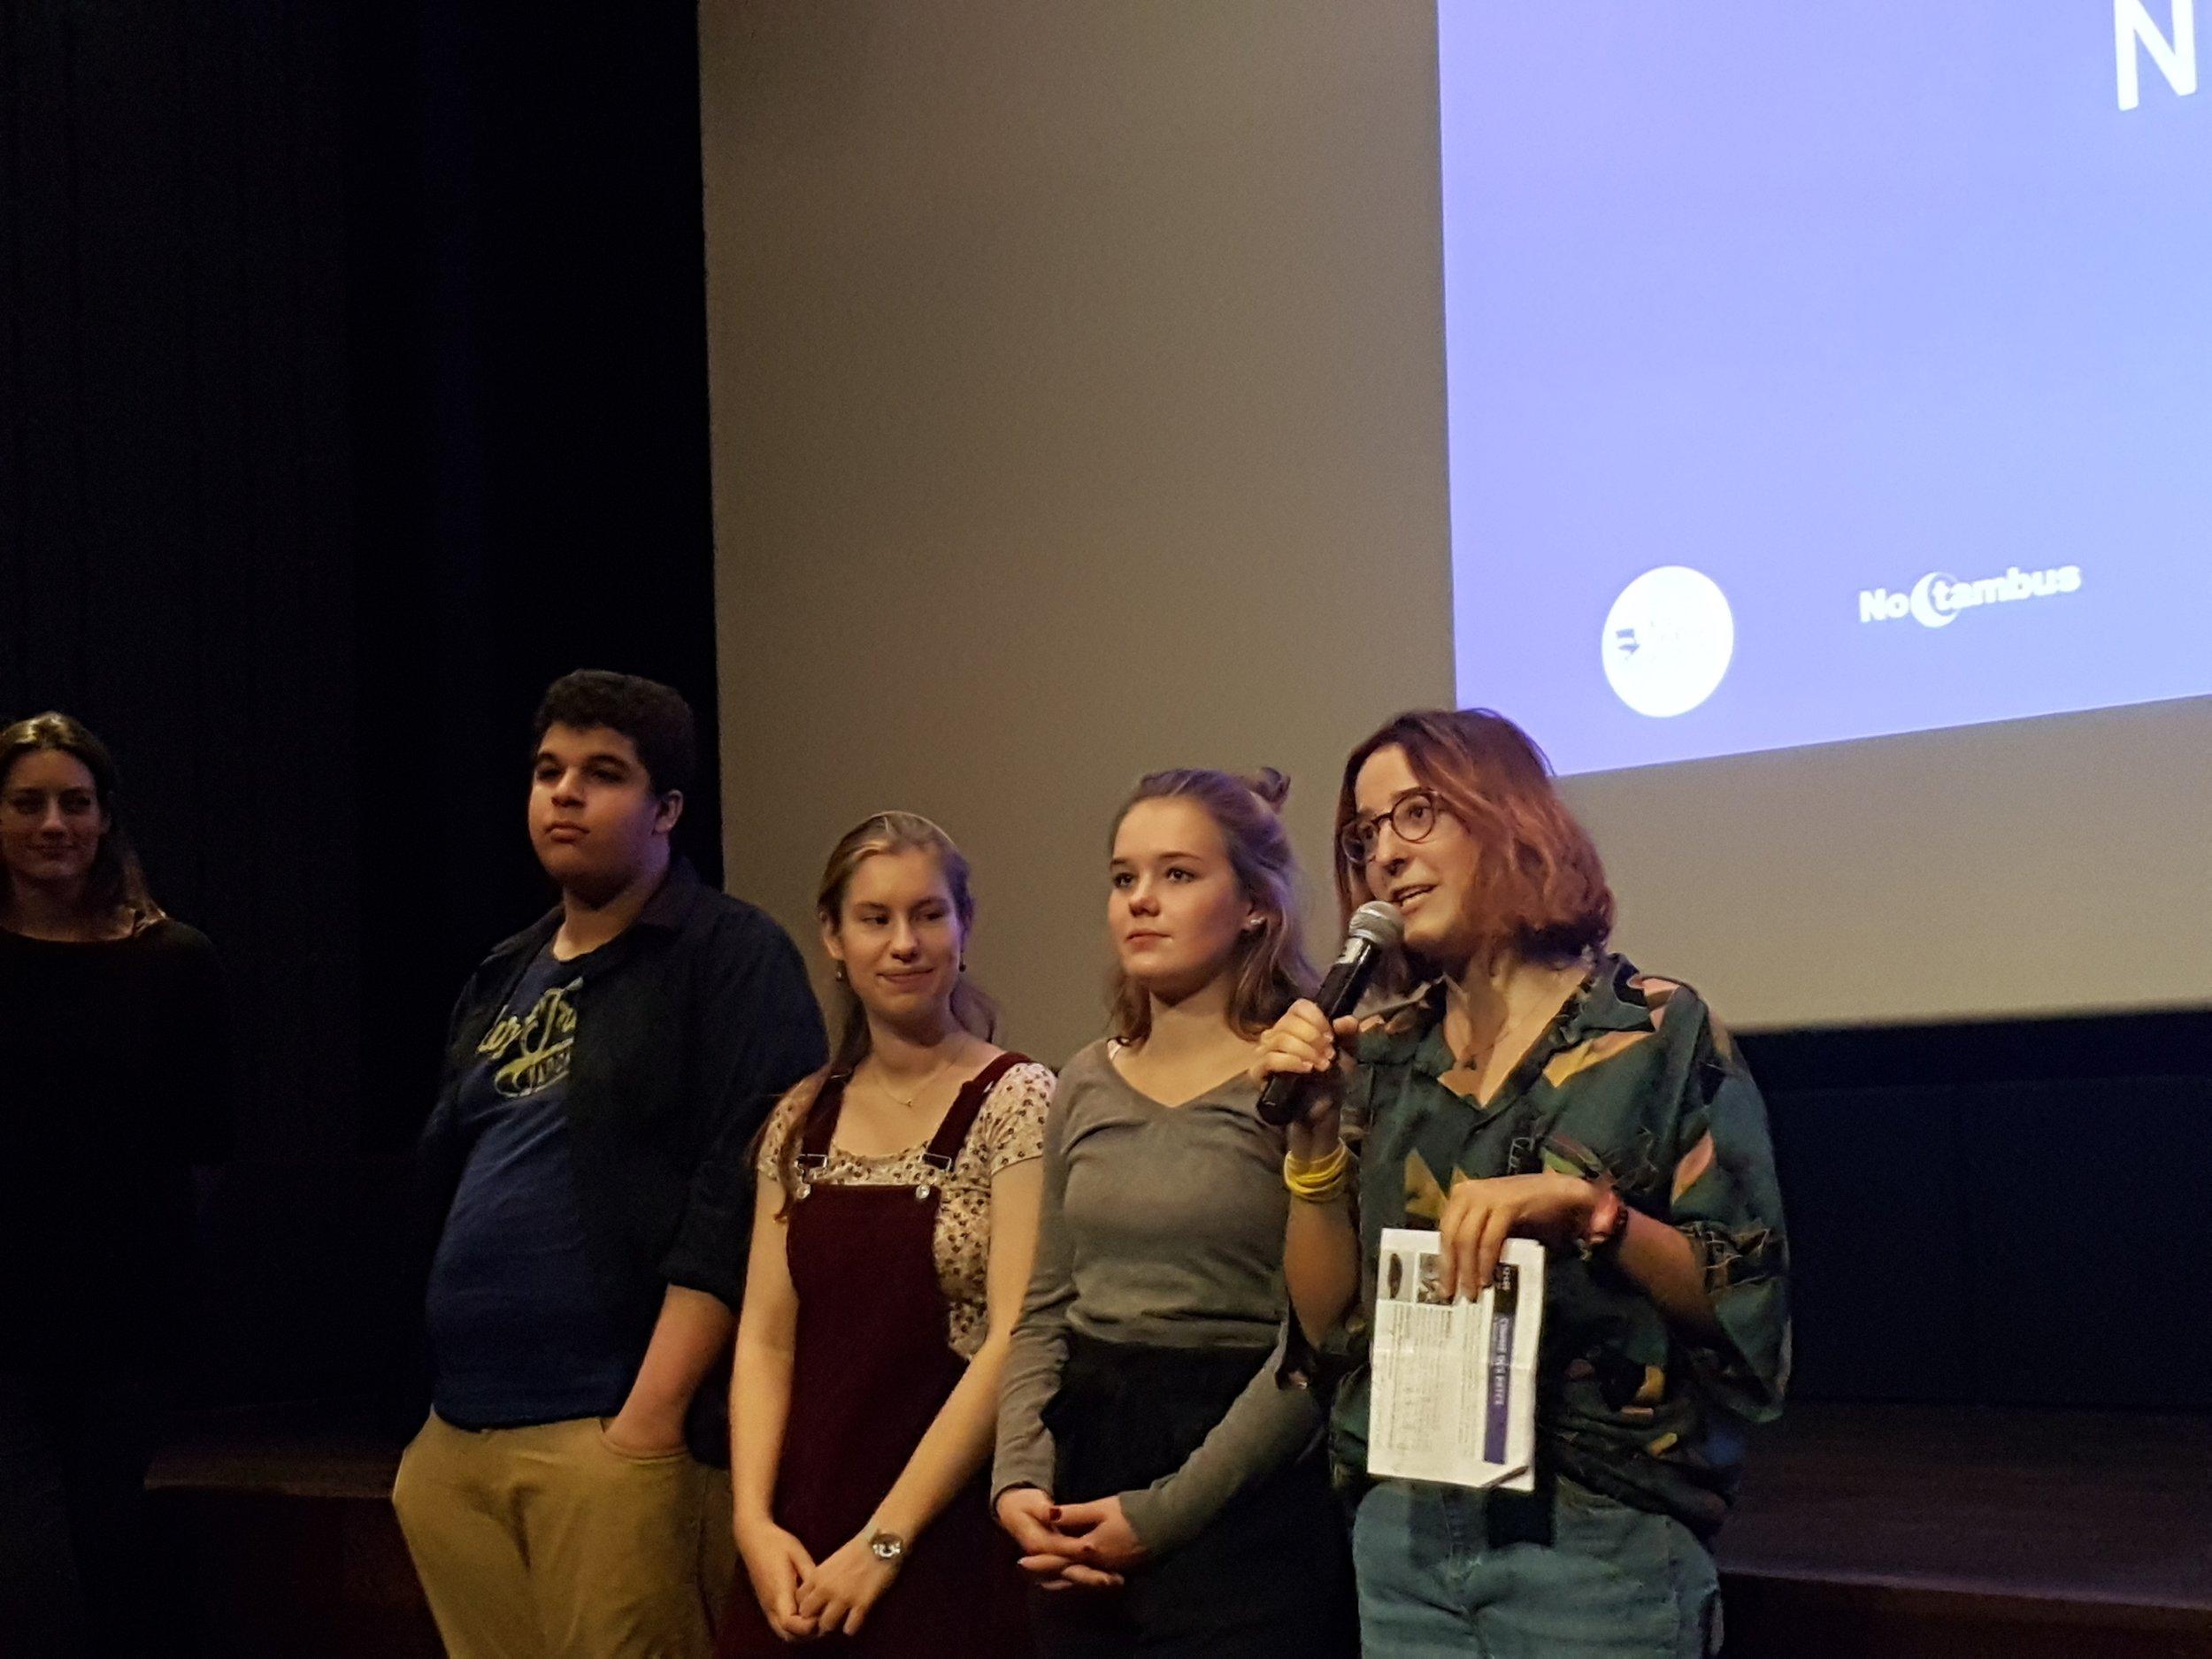 NDC18_2018-09-21_Geneve_Jury-des-jeunes_6.jpg